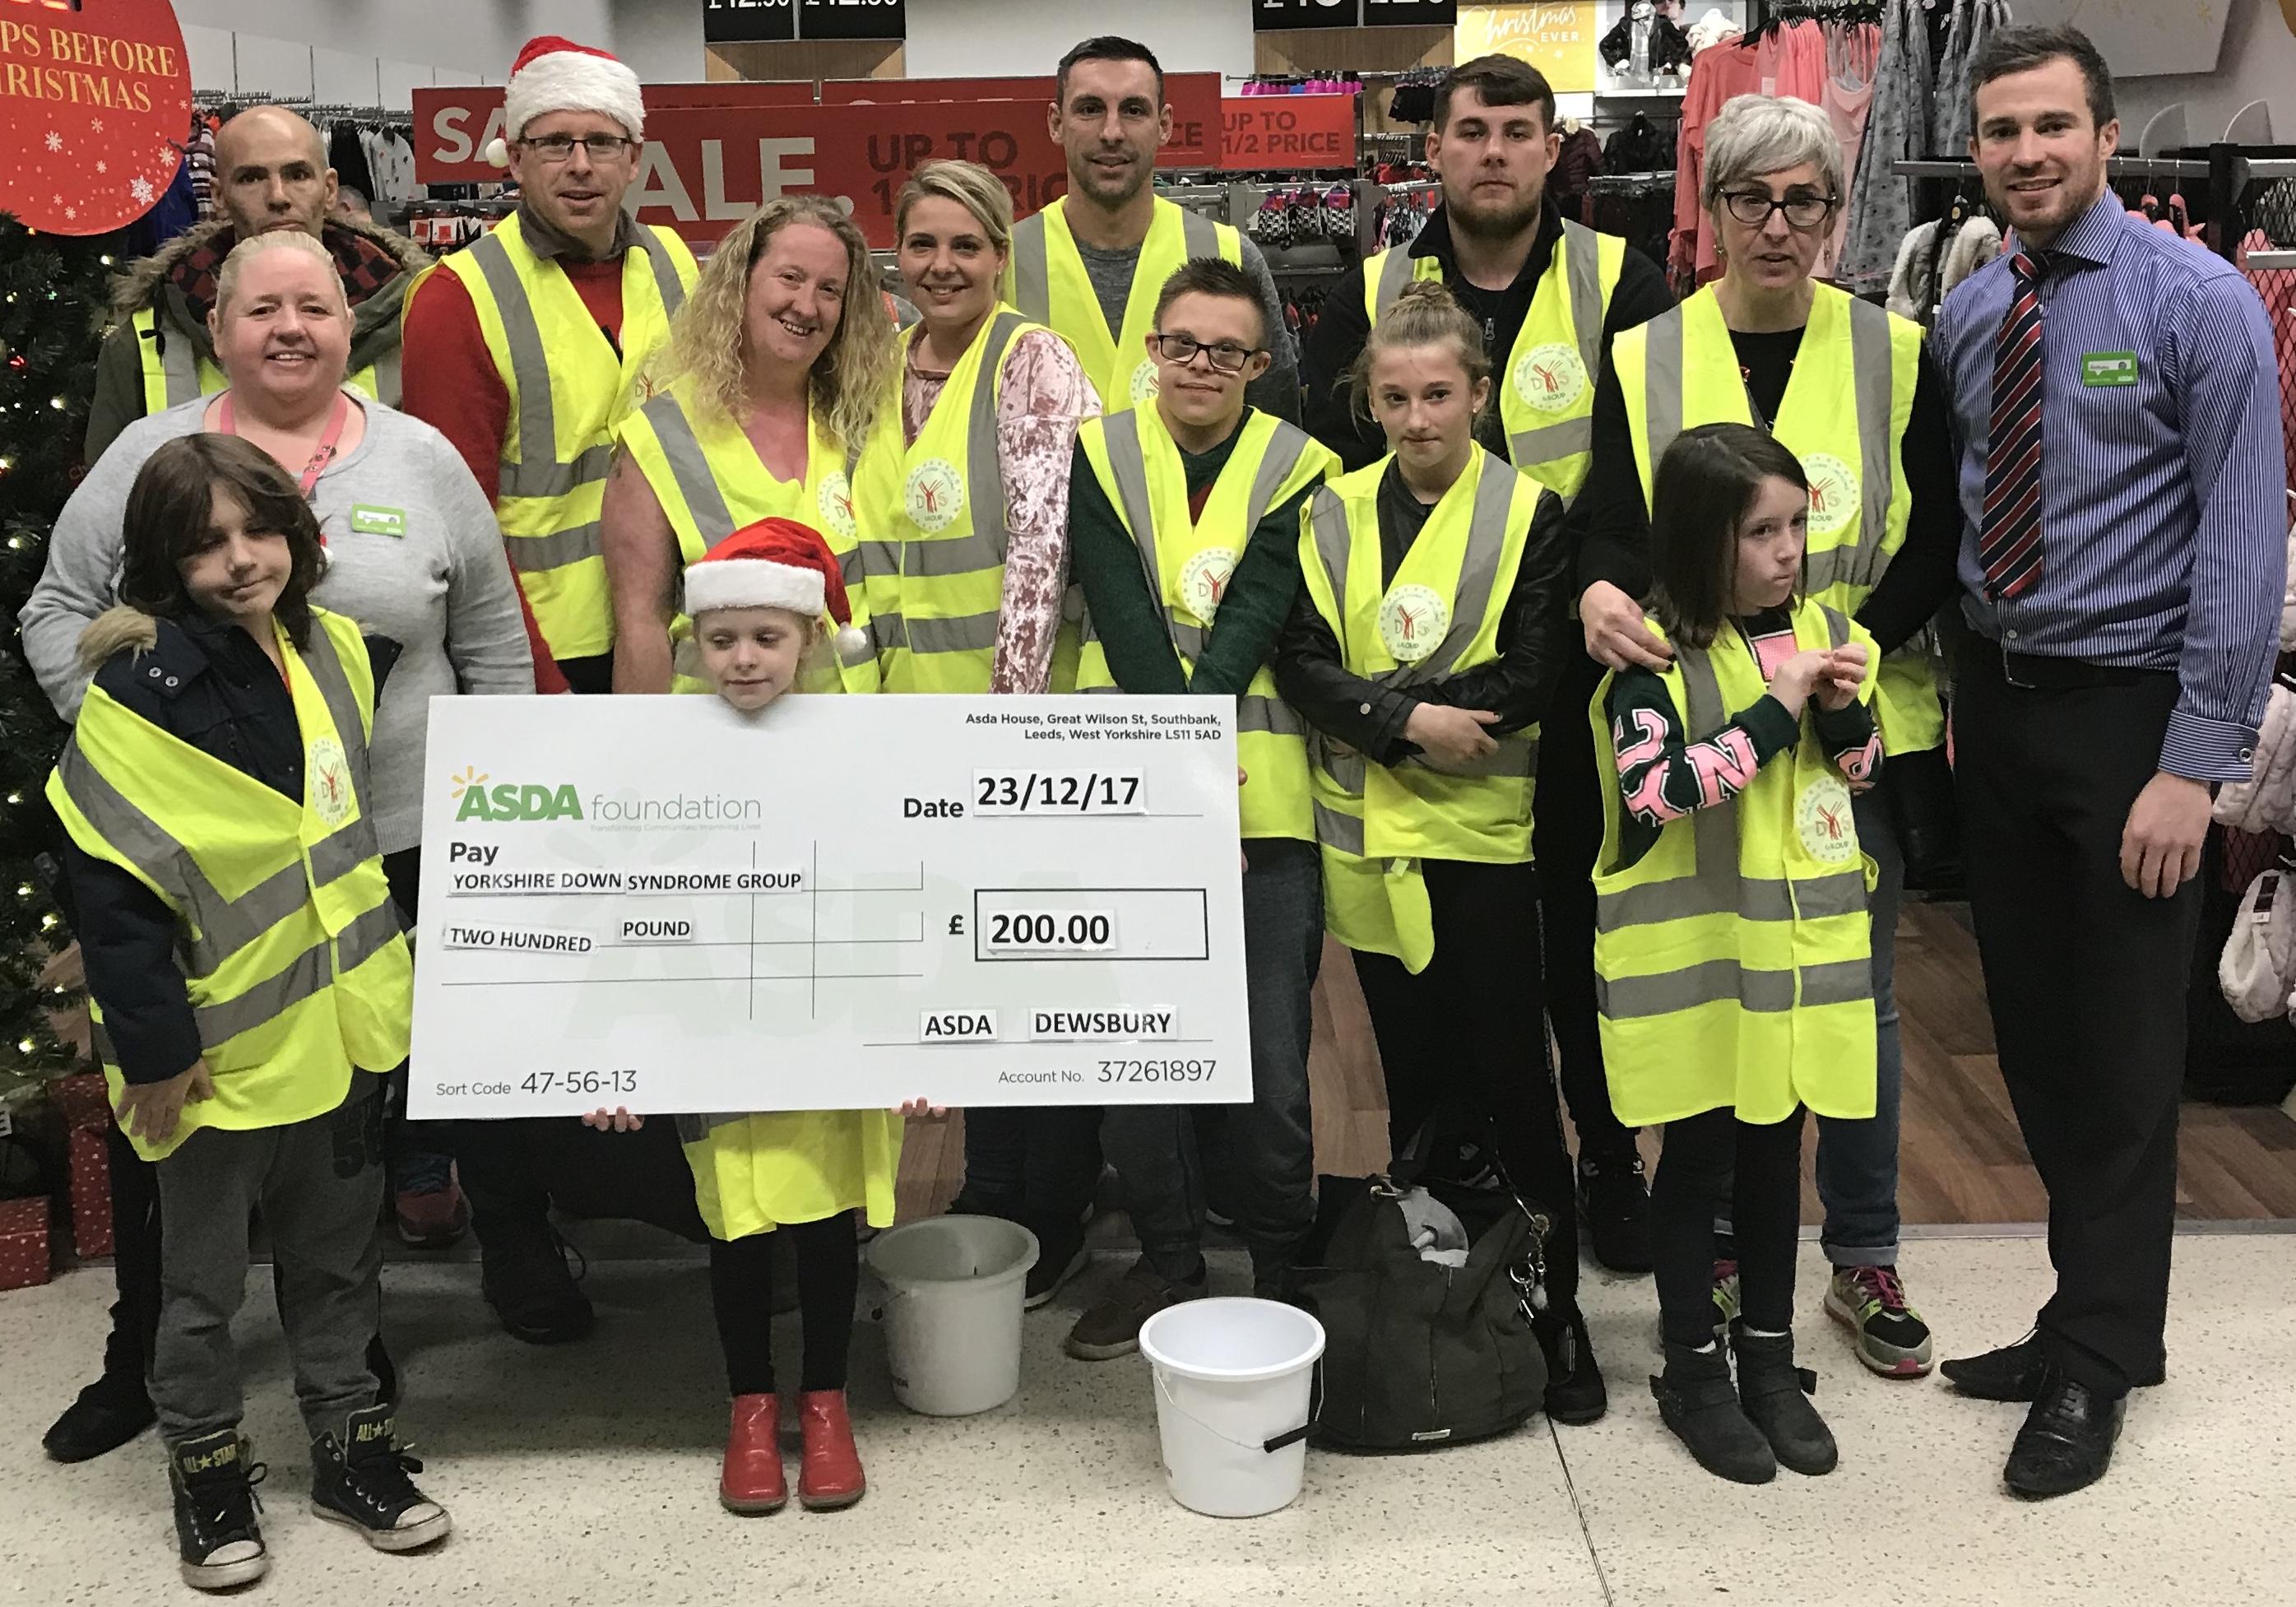 Dewsbury donation two